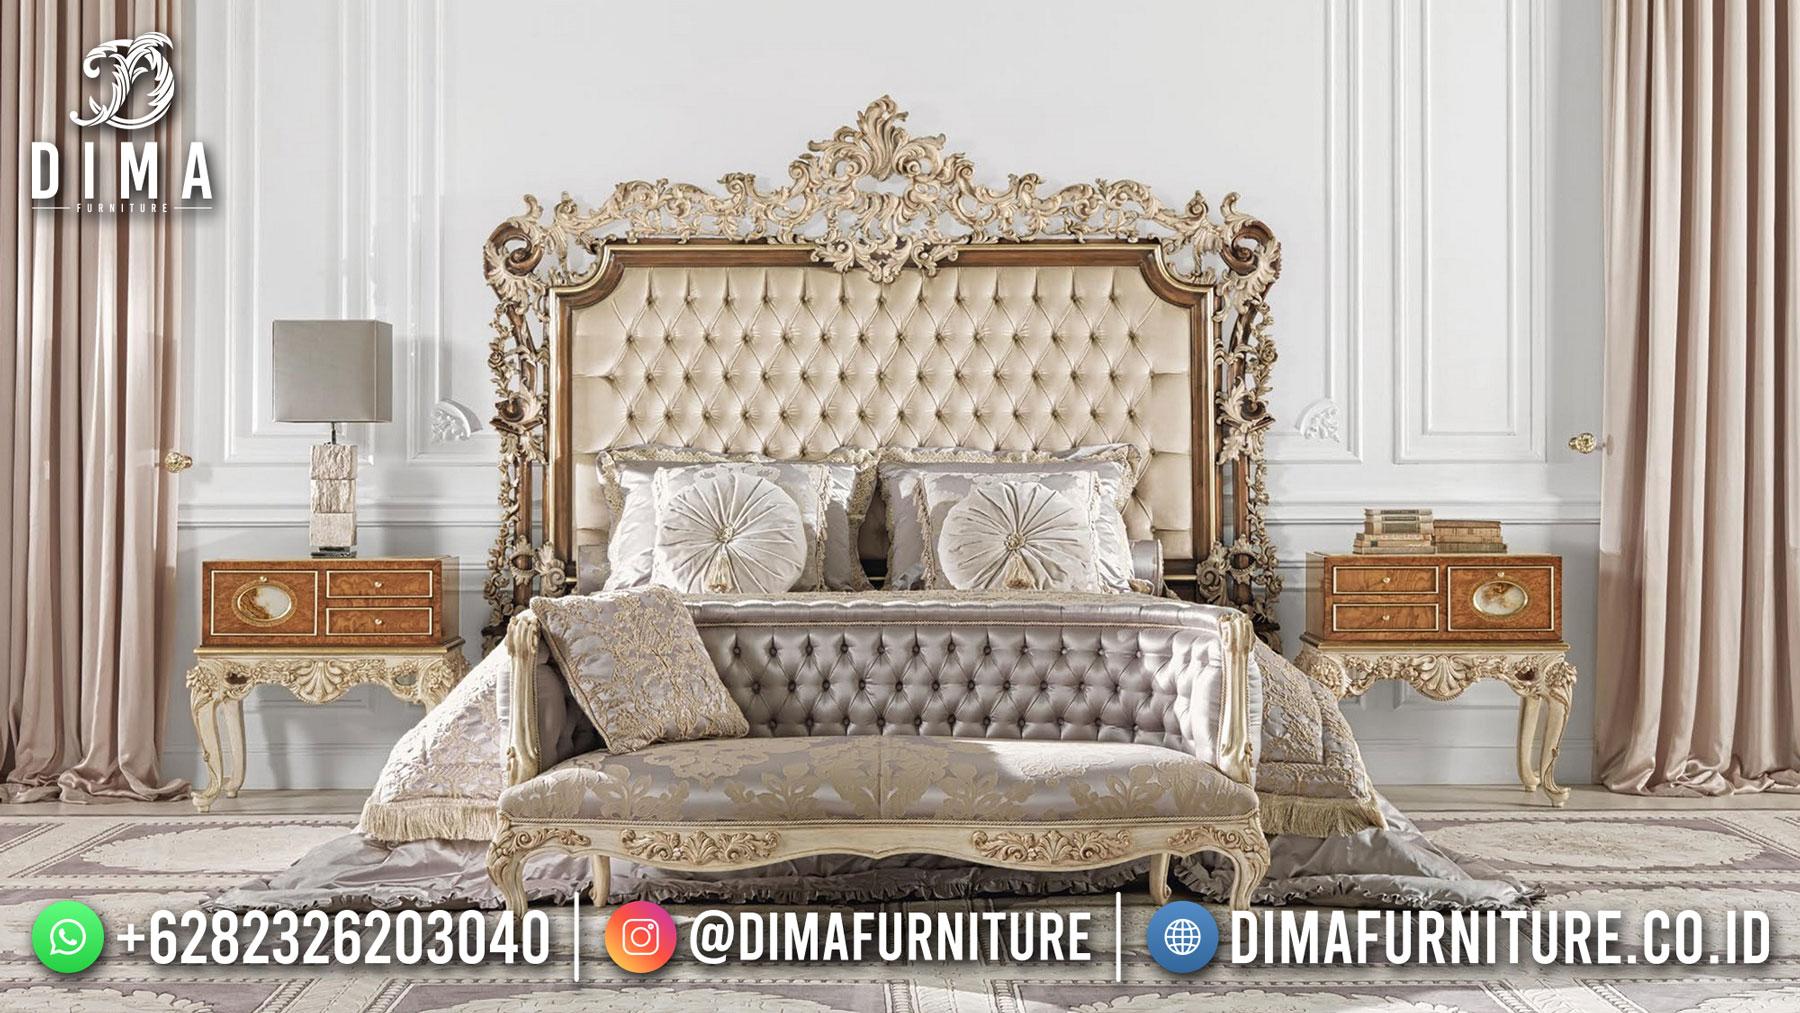 Harga Set Kamar Tidur Mewah Ukiran Jepara Luxury Great Duco Color ST-1422